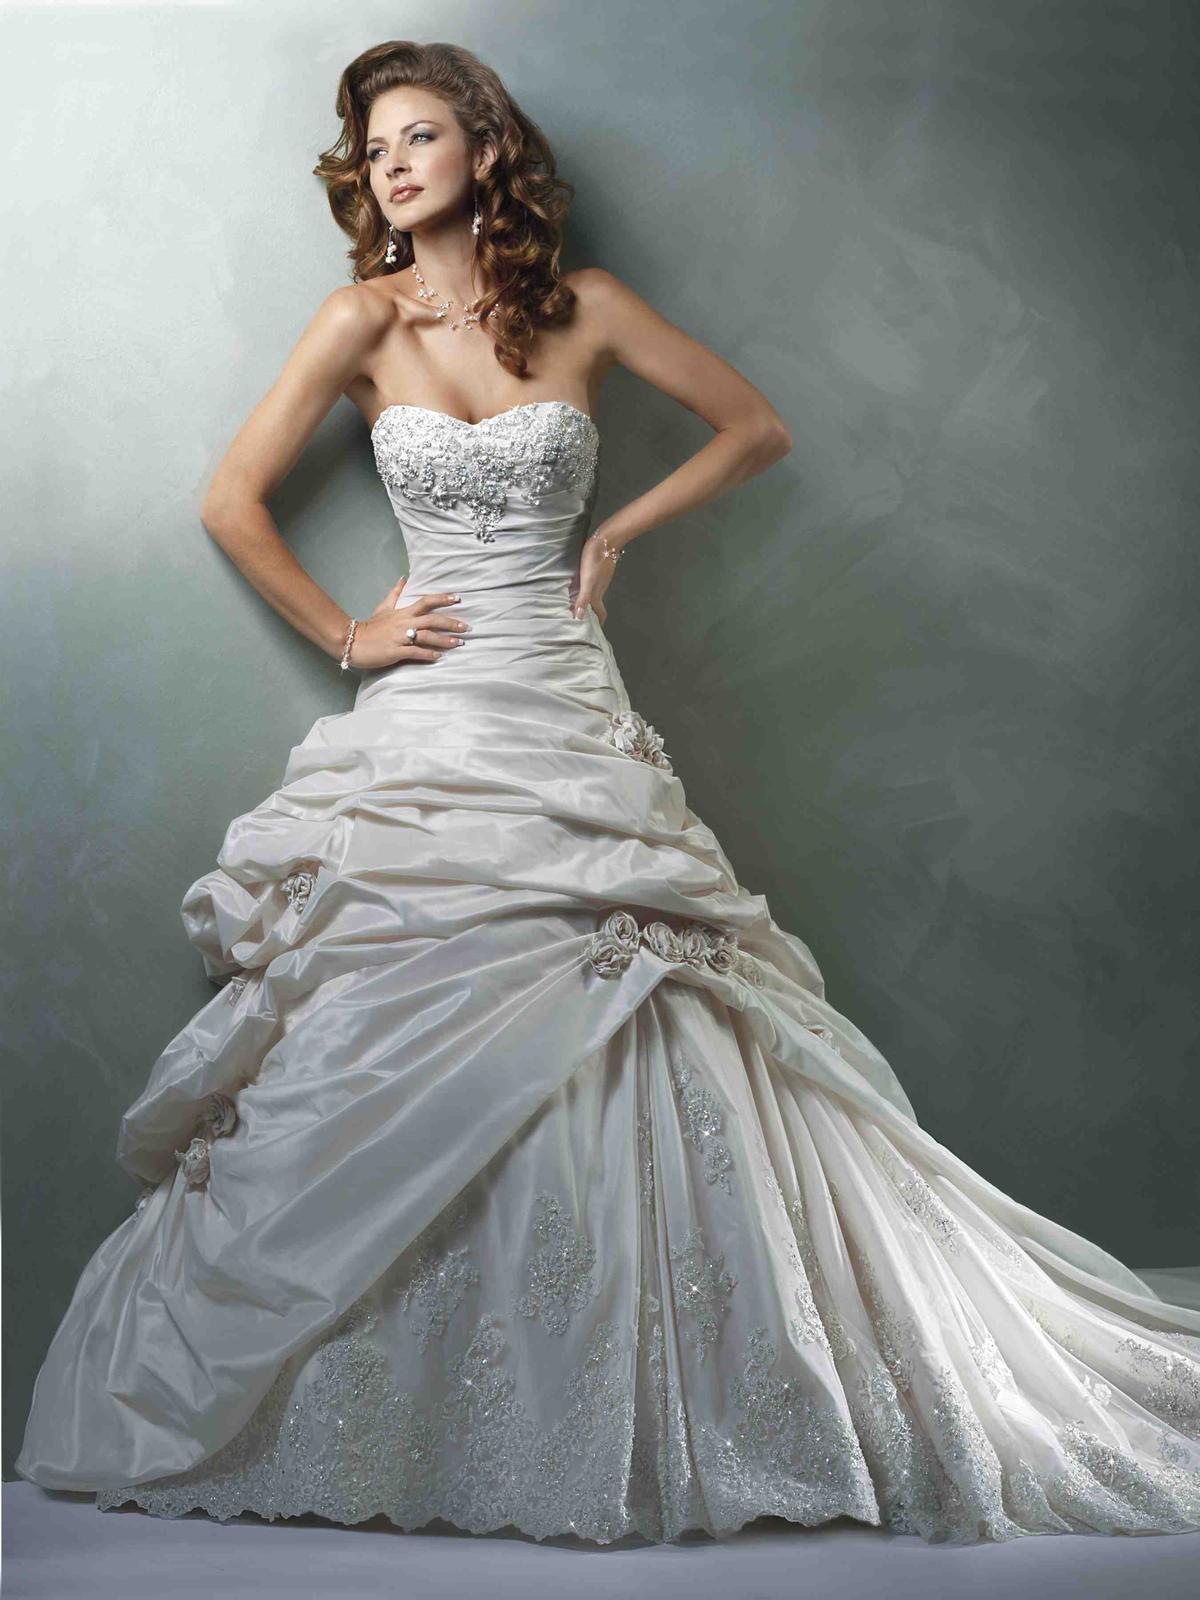 Svadobné šaty Maggie Sottero - model Sa Belle - Obrázok č. 1